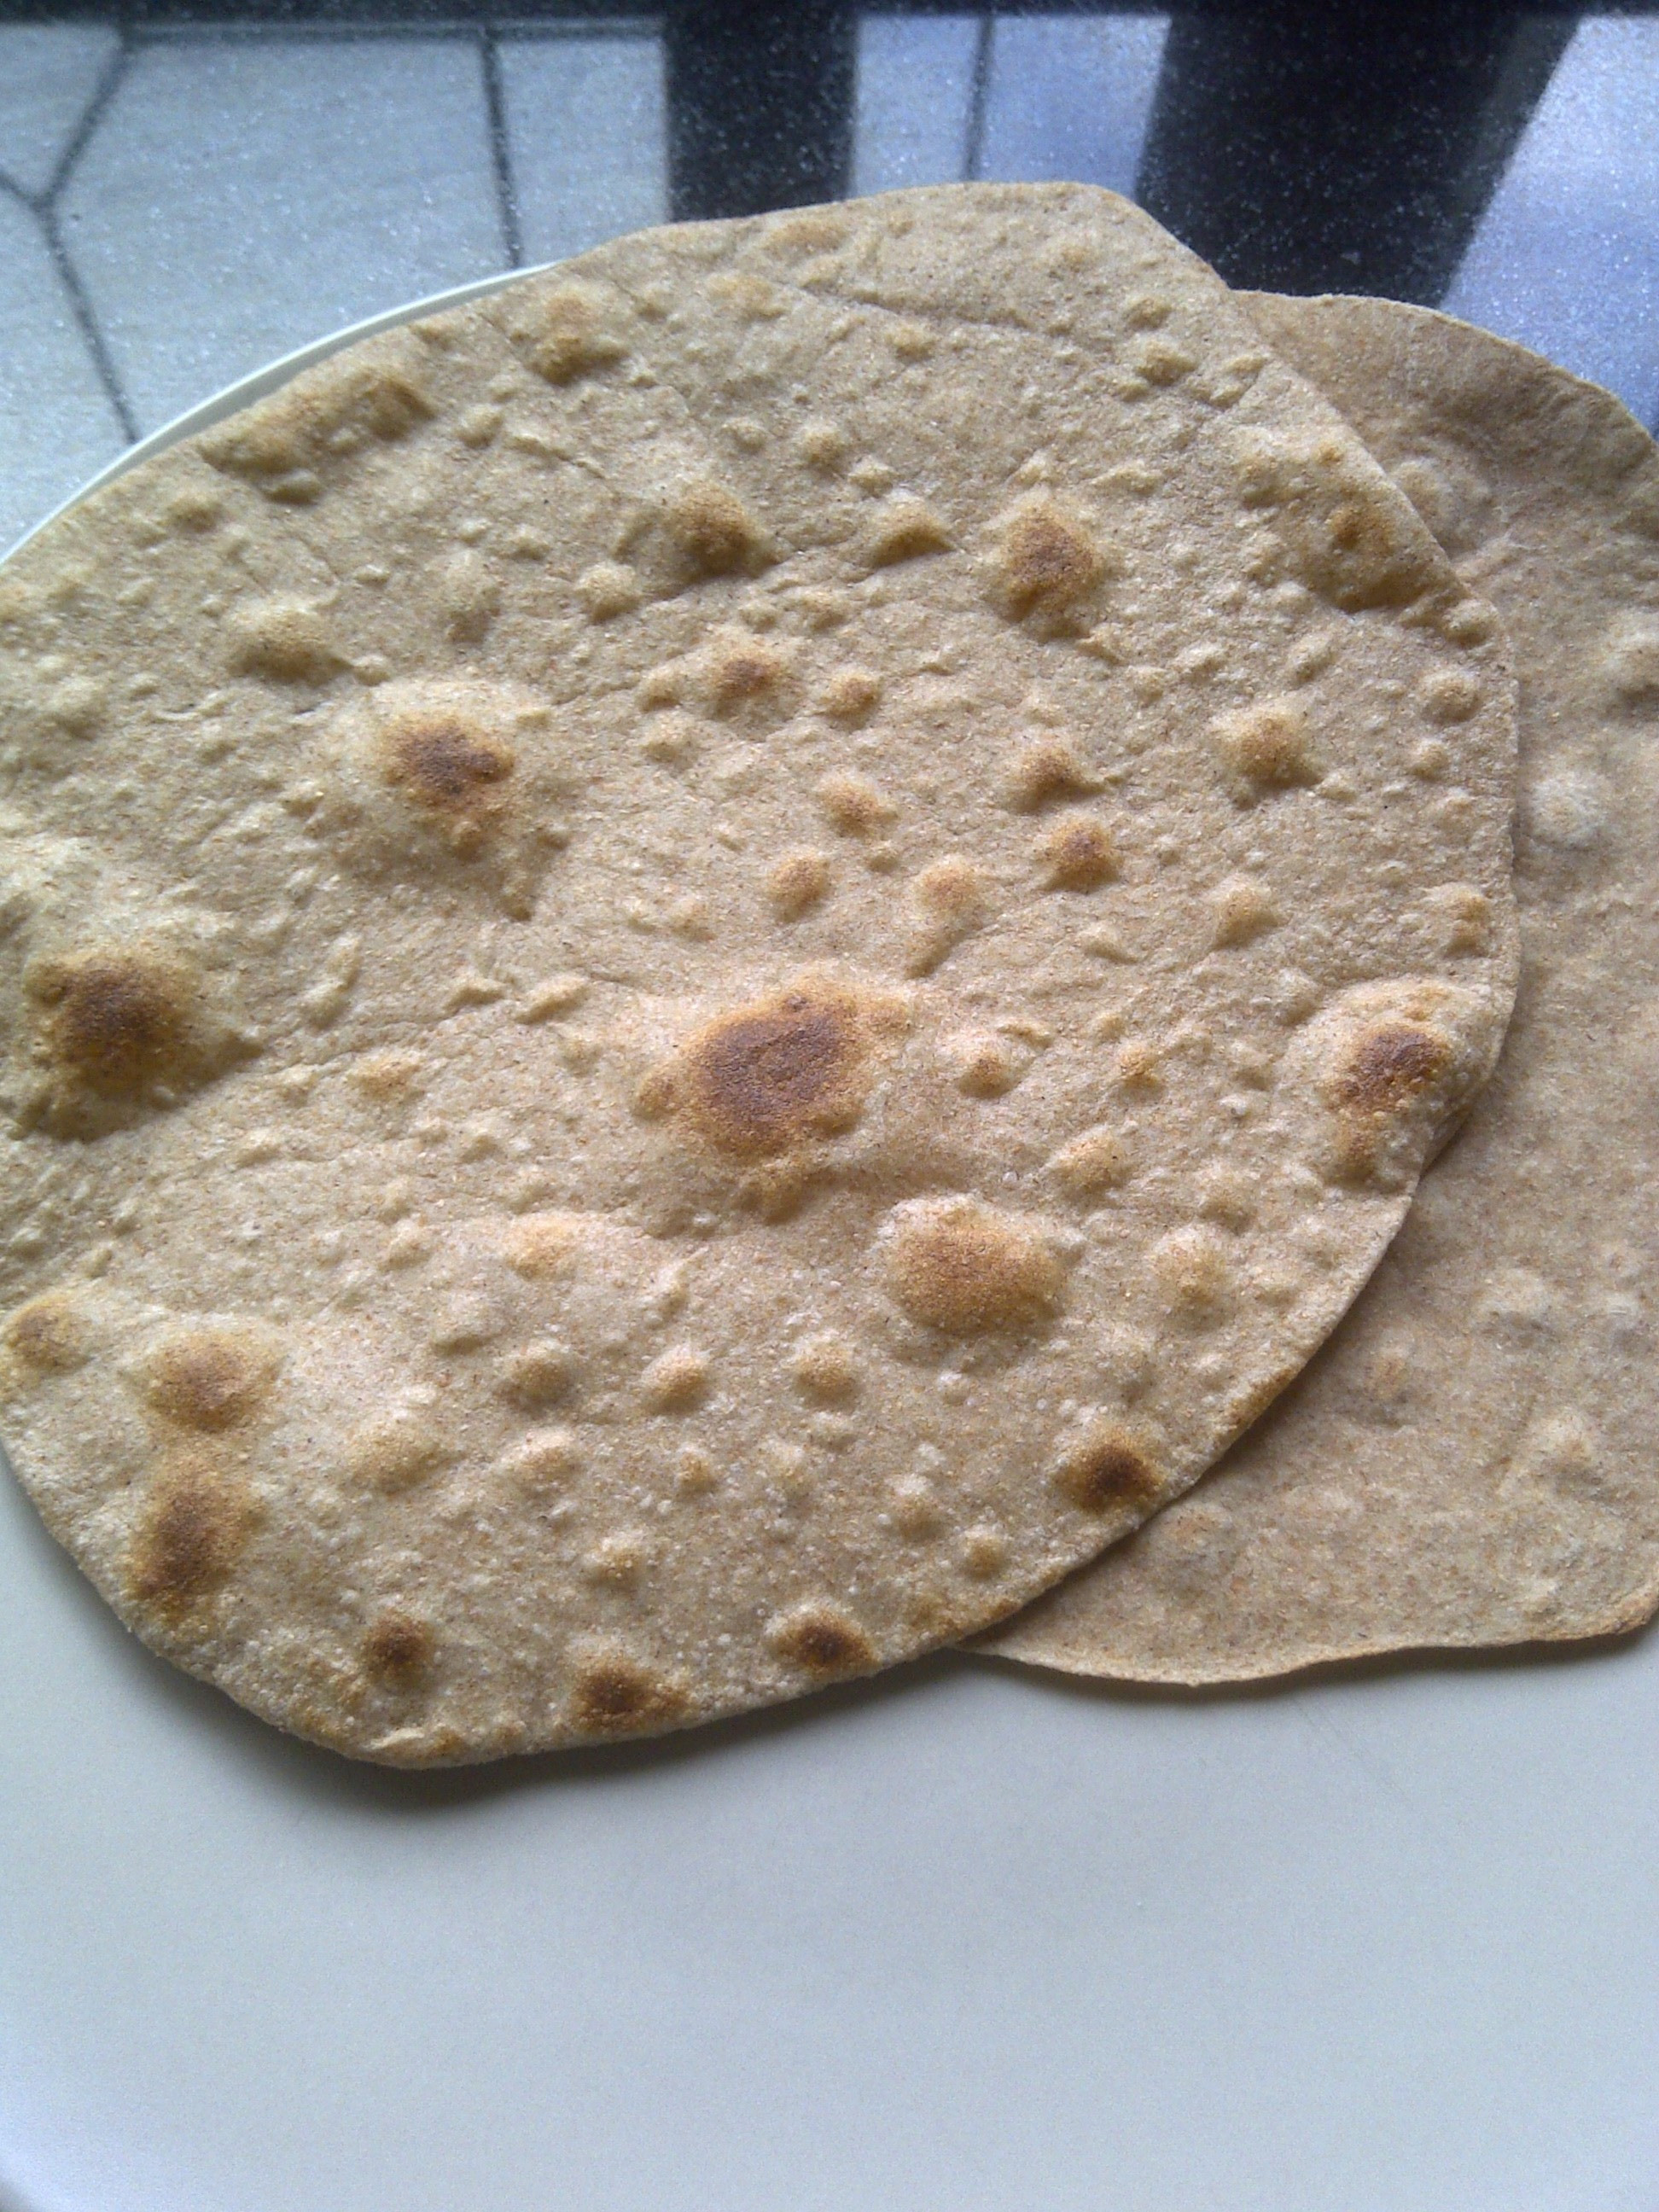 Indian Bread Recipe  Simple Indian Flat Bread Recipe – Easy Peasy